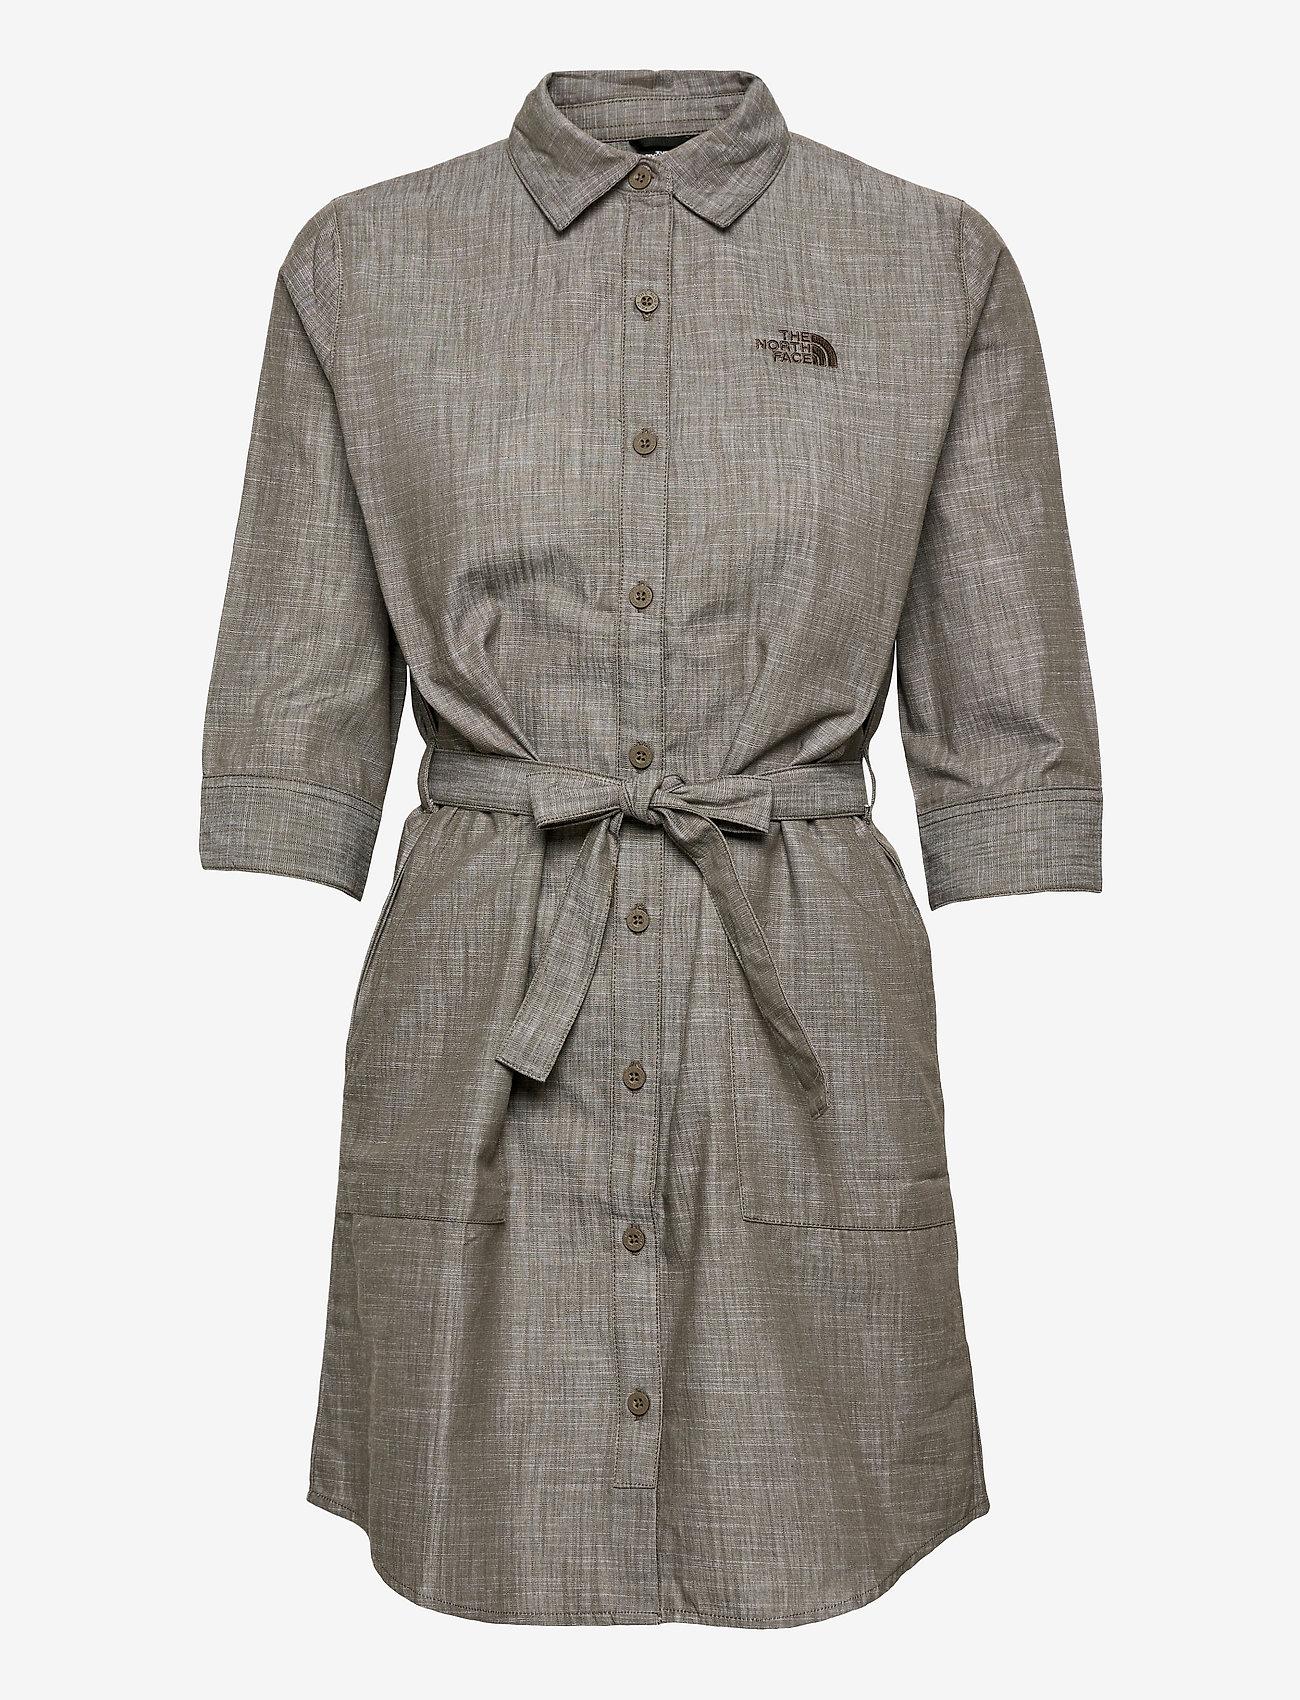 The North Face - W BERNINA DRESS - sommerkjoler - new taupe green chambray - 0